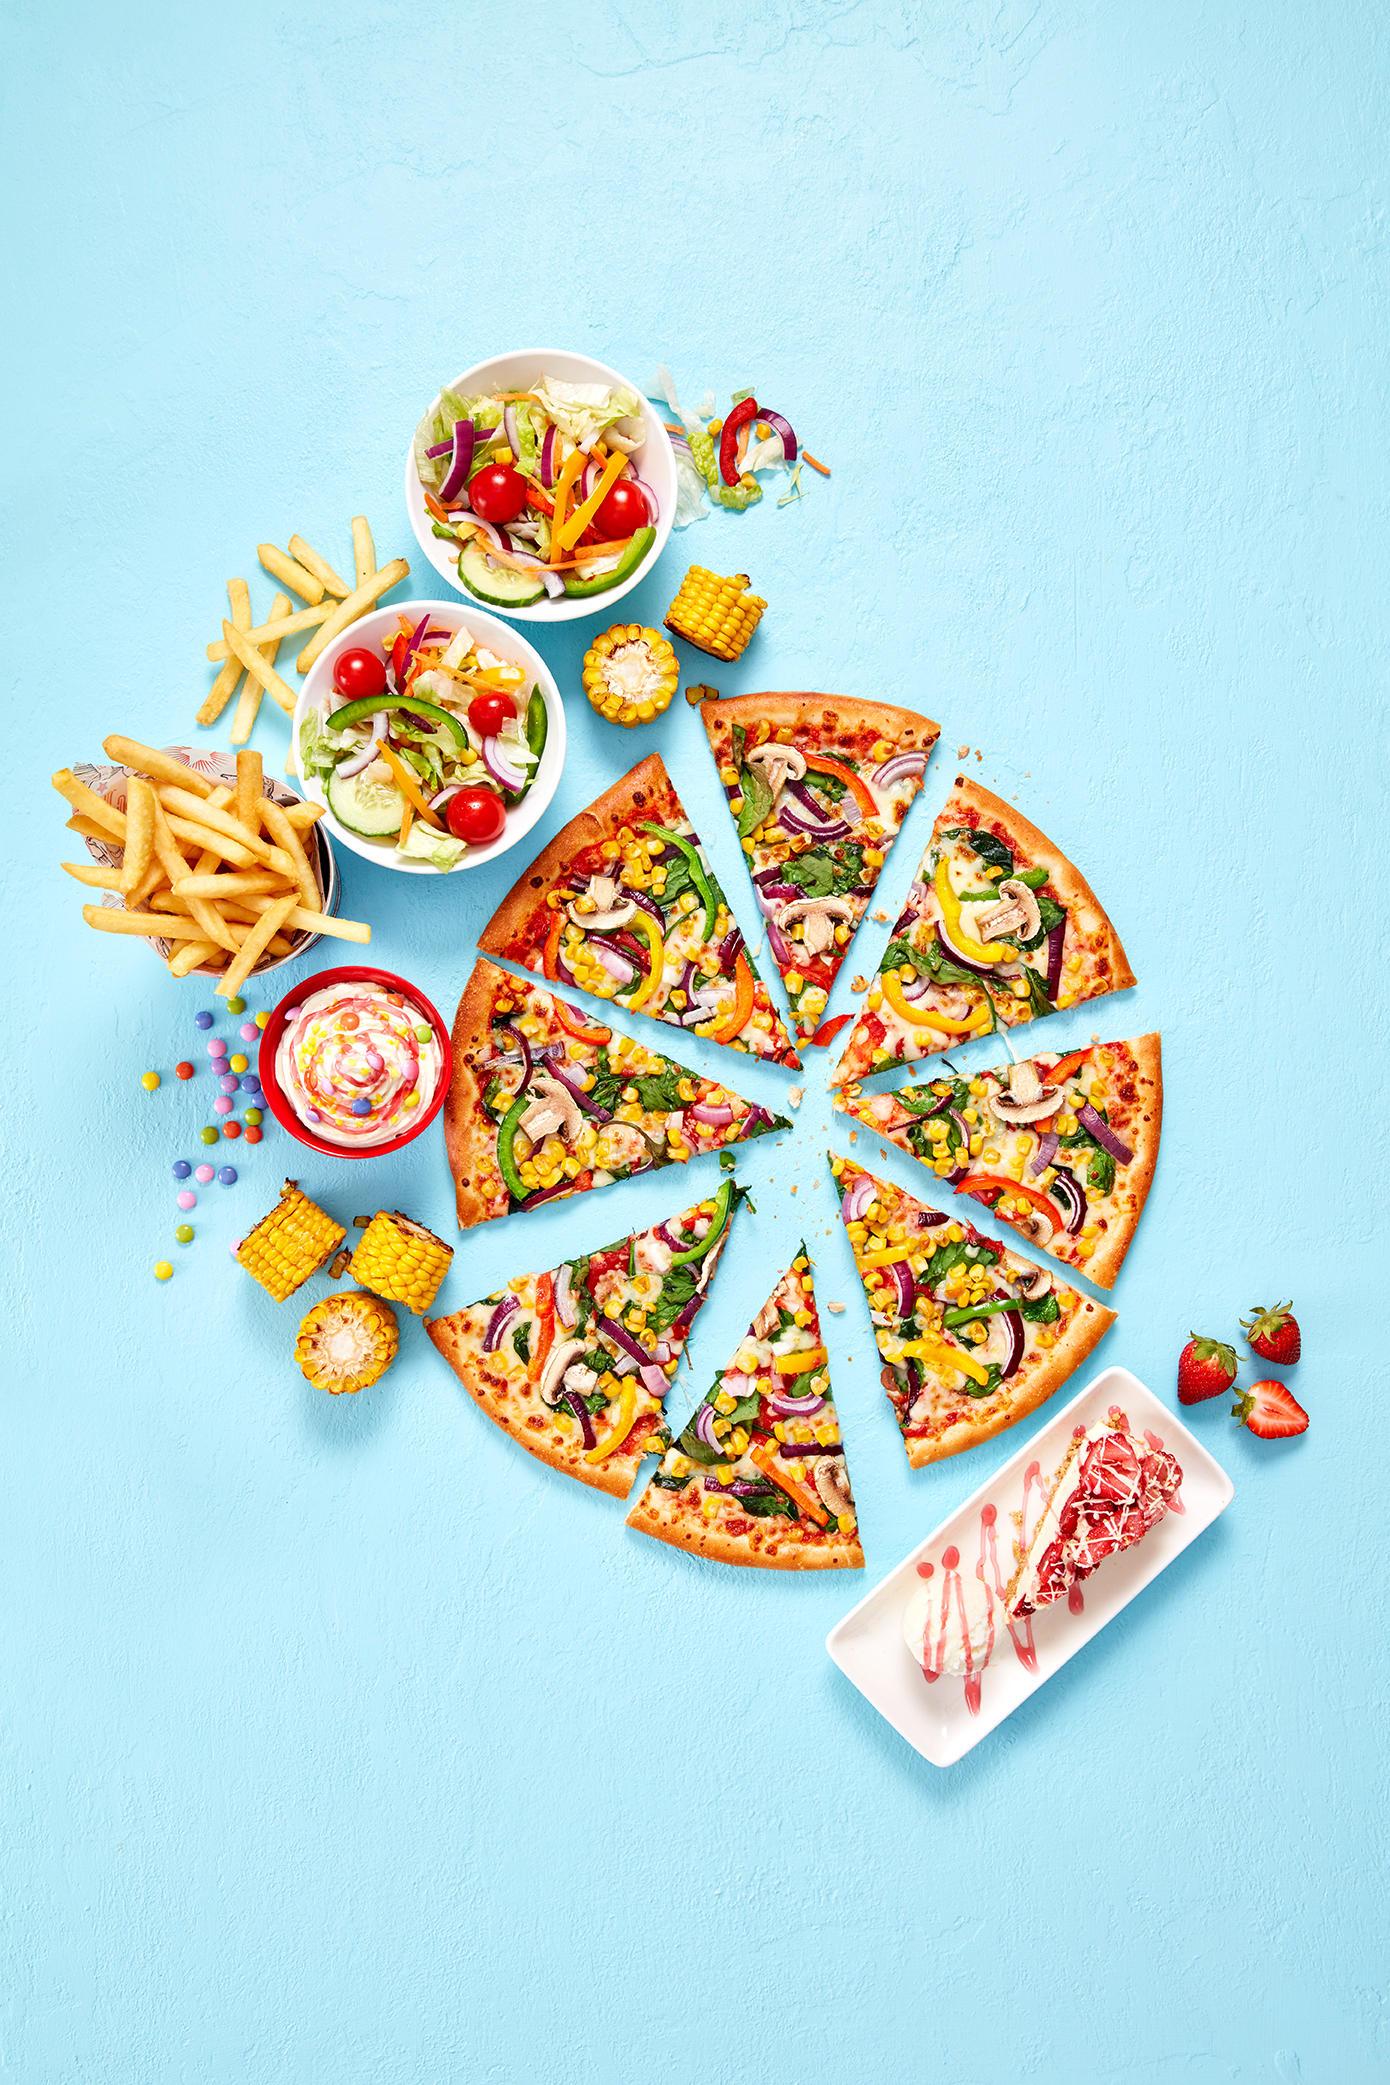 Pizza Hut Restaurants - The Big Sharer Meal Deal! Pizza Hut Restaurants Glasgow 01236 721122